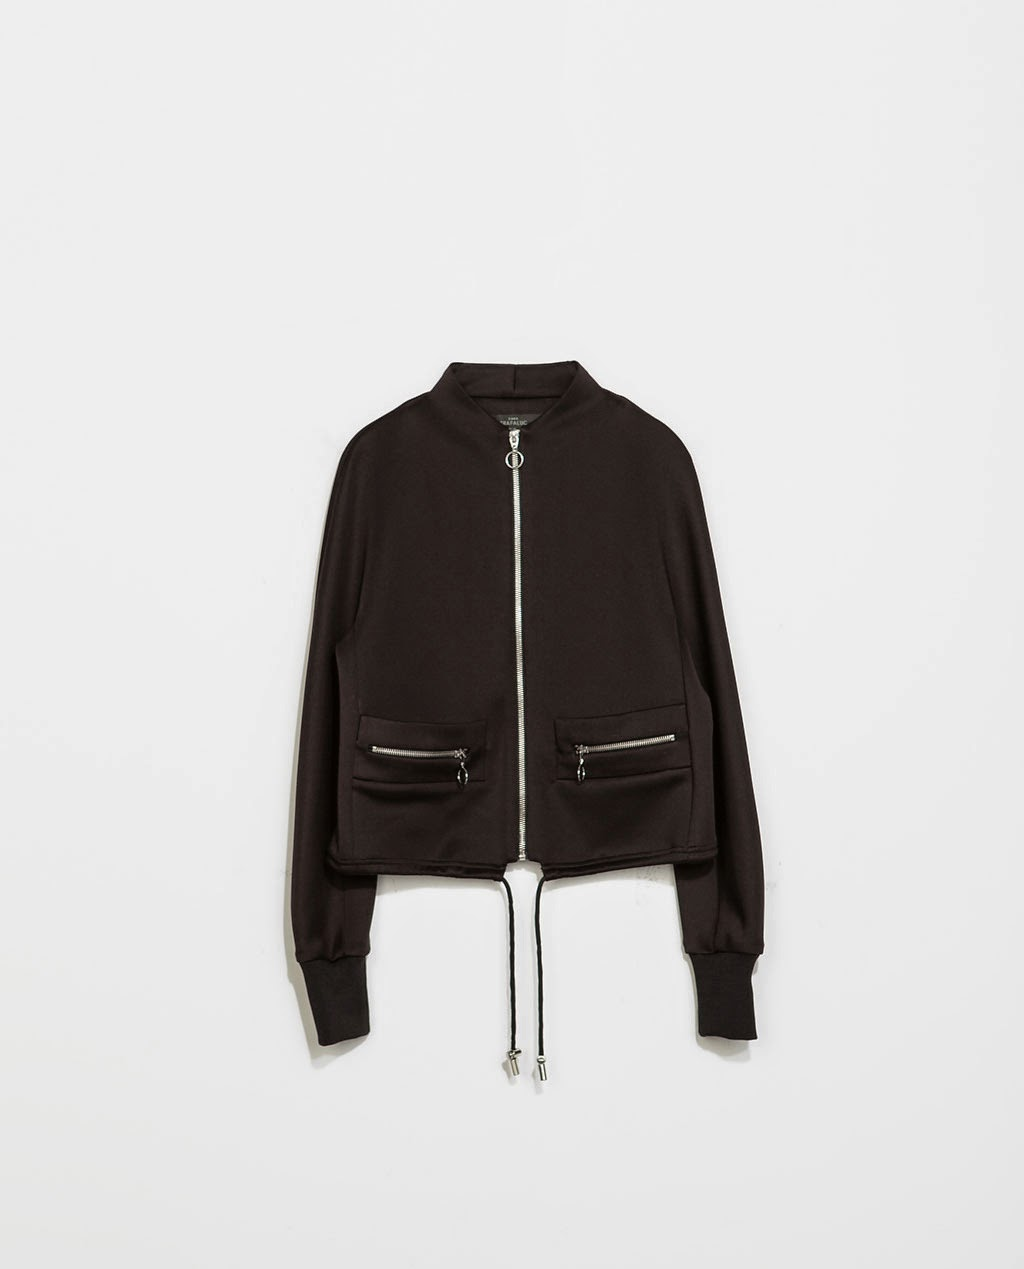 Cazadora de neopreno, Zara, jacket